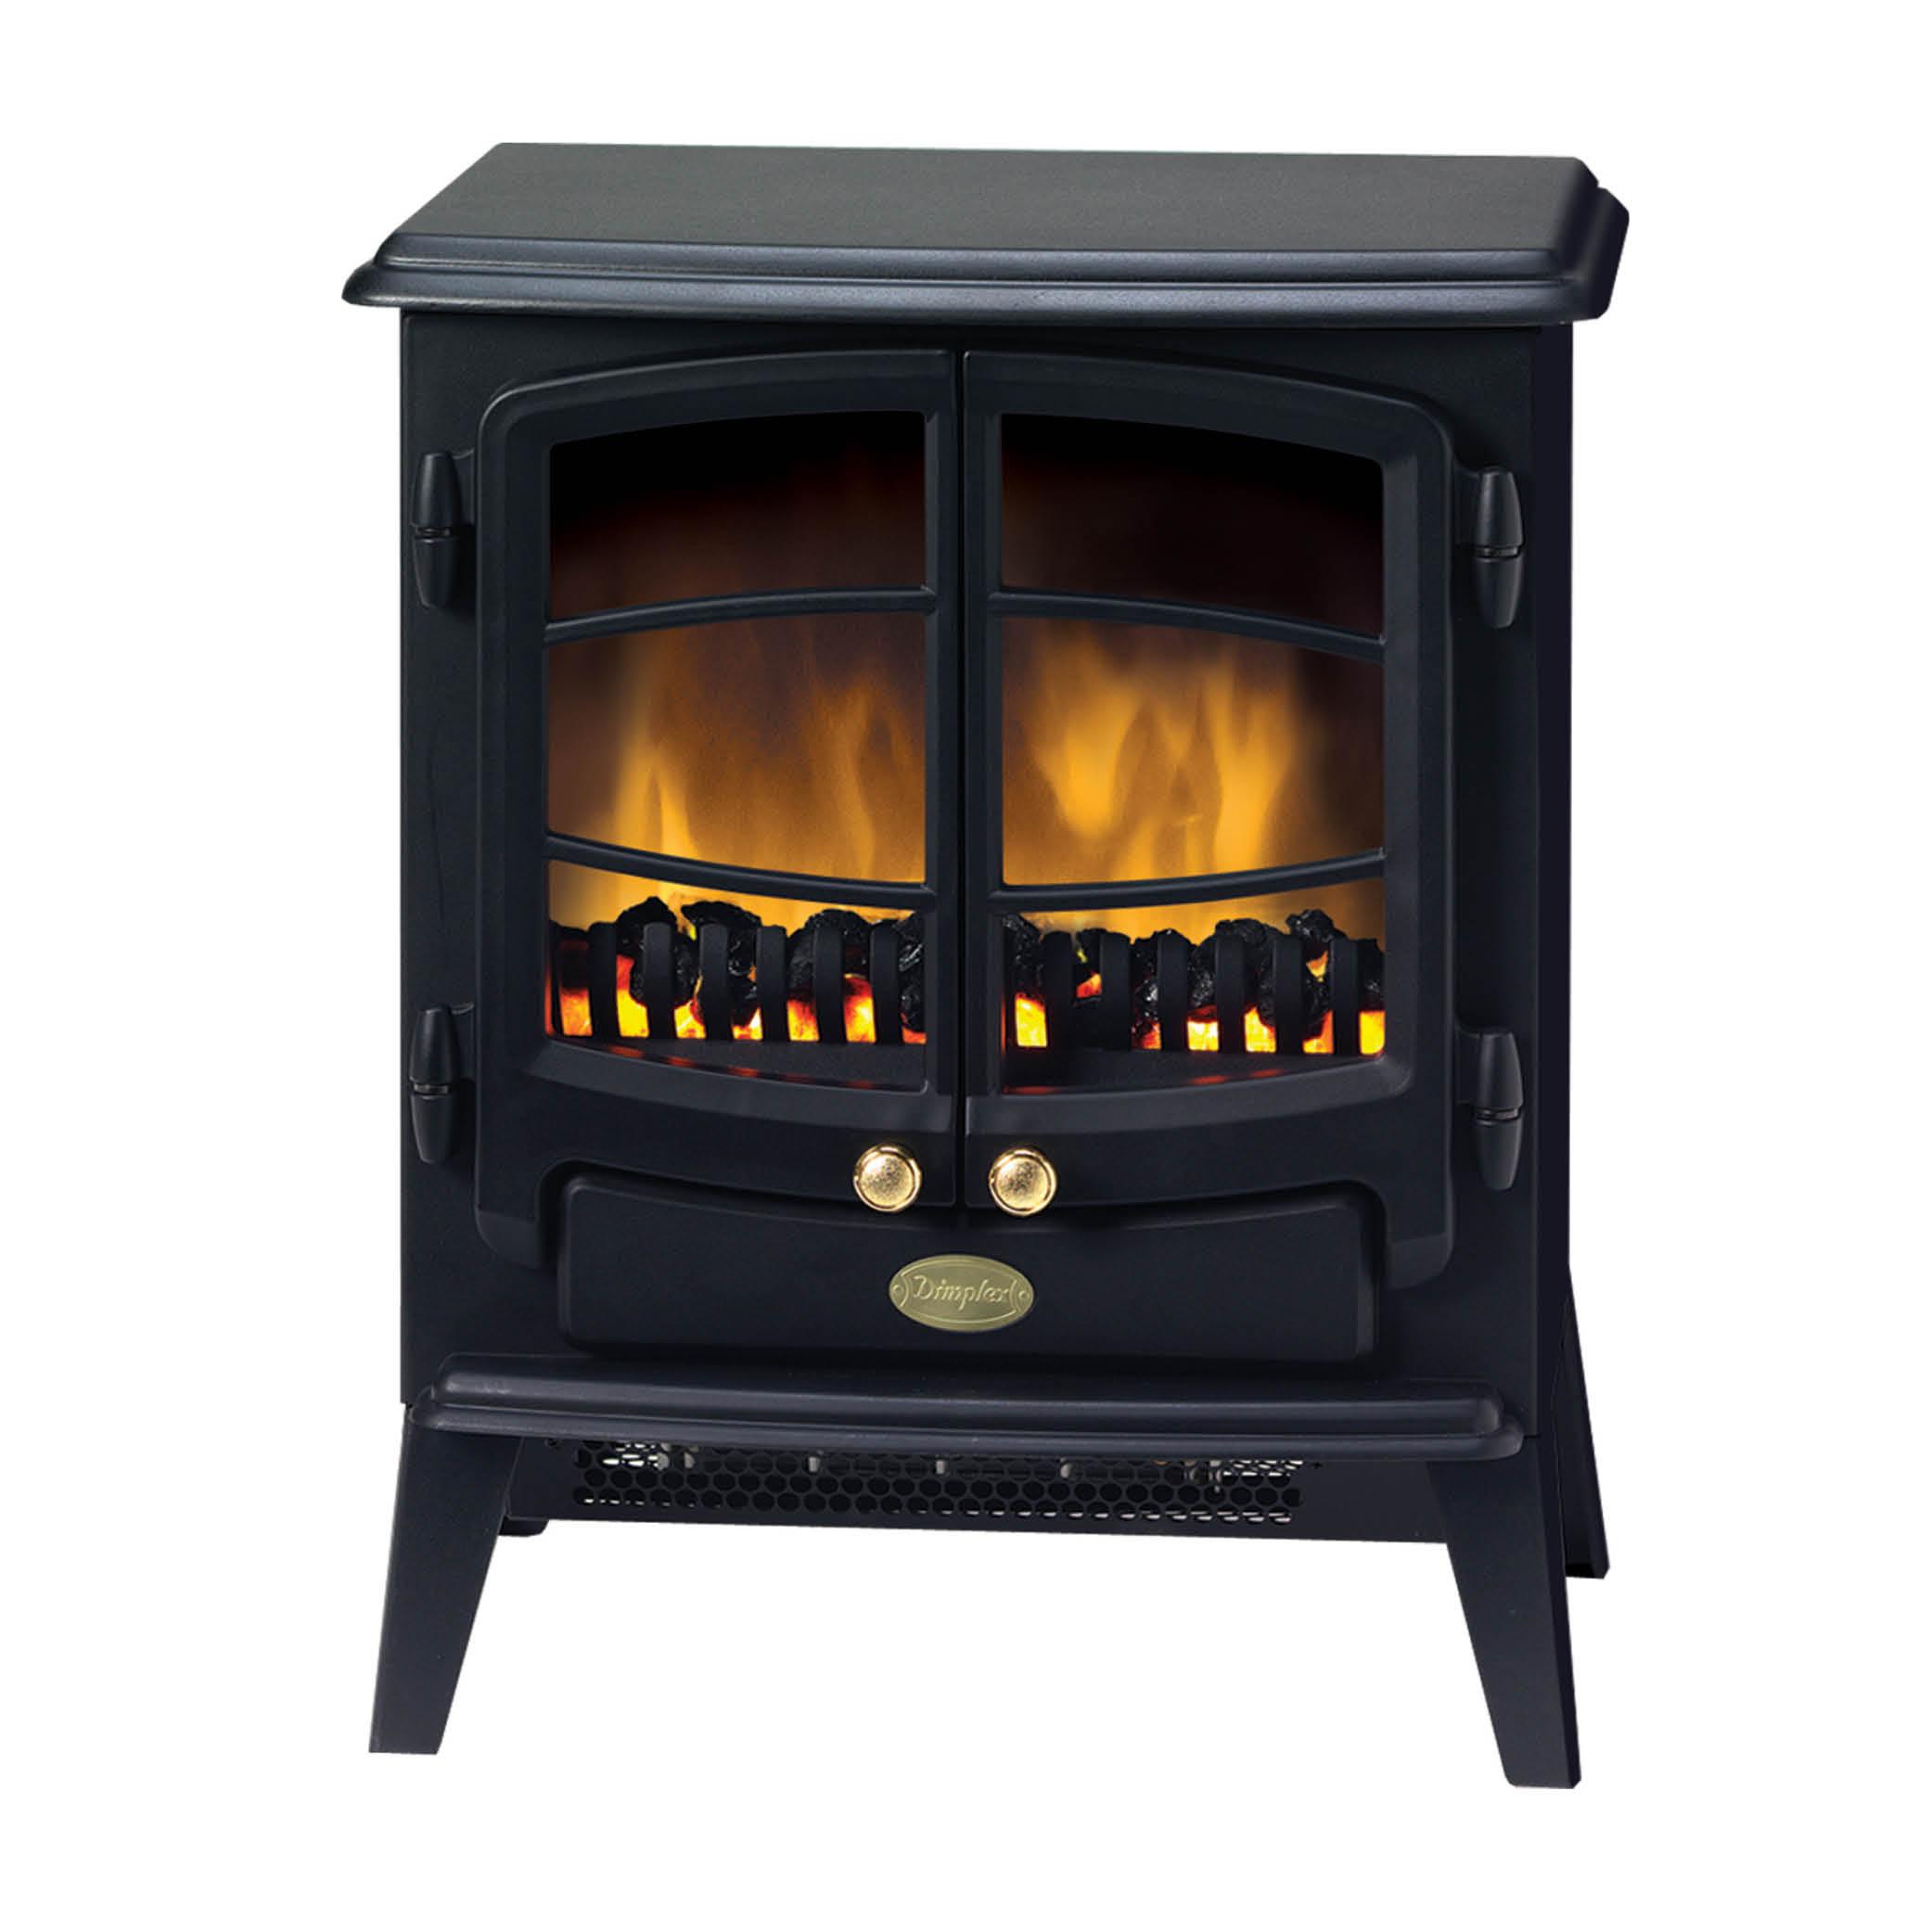 Dimplex Tango Gold Coast Retailer Electric Heating